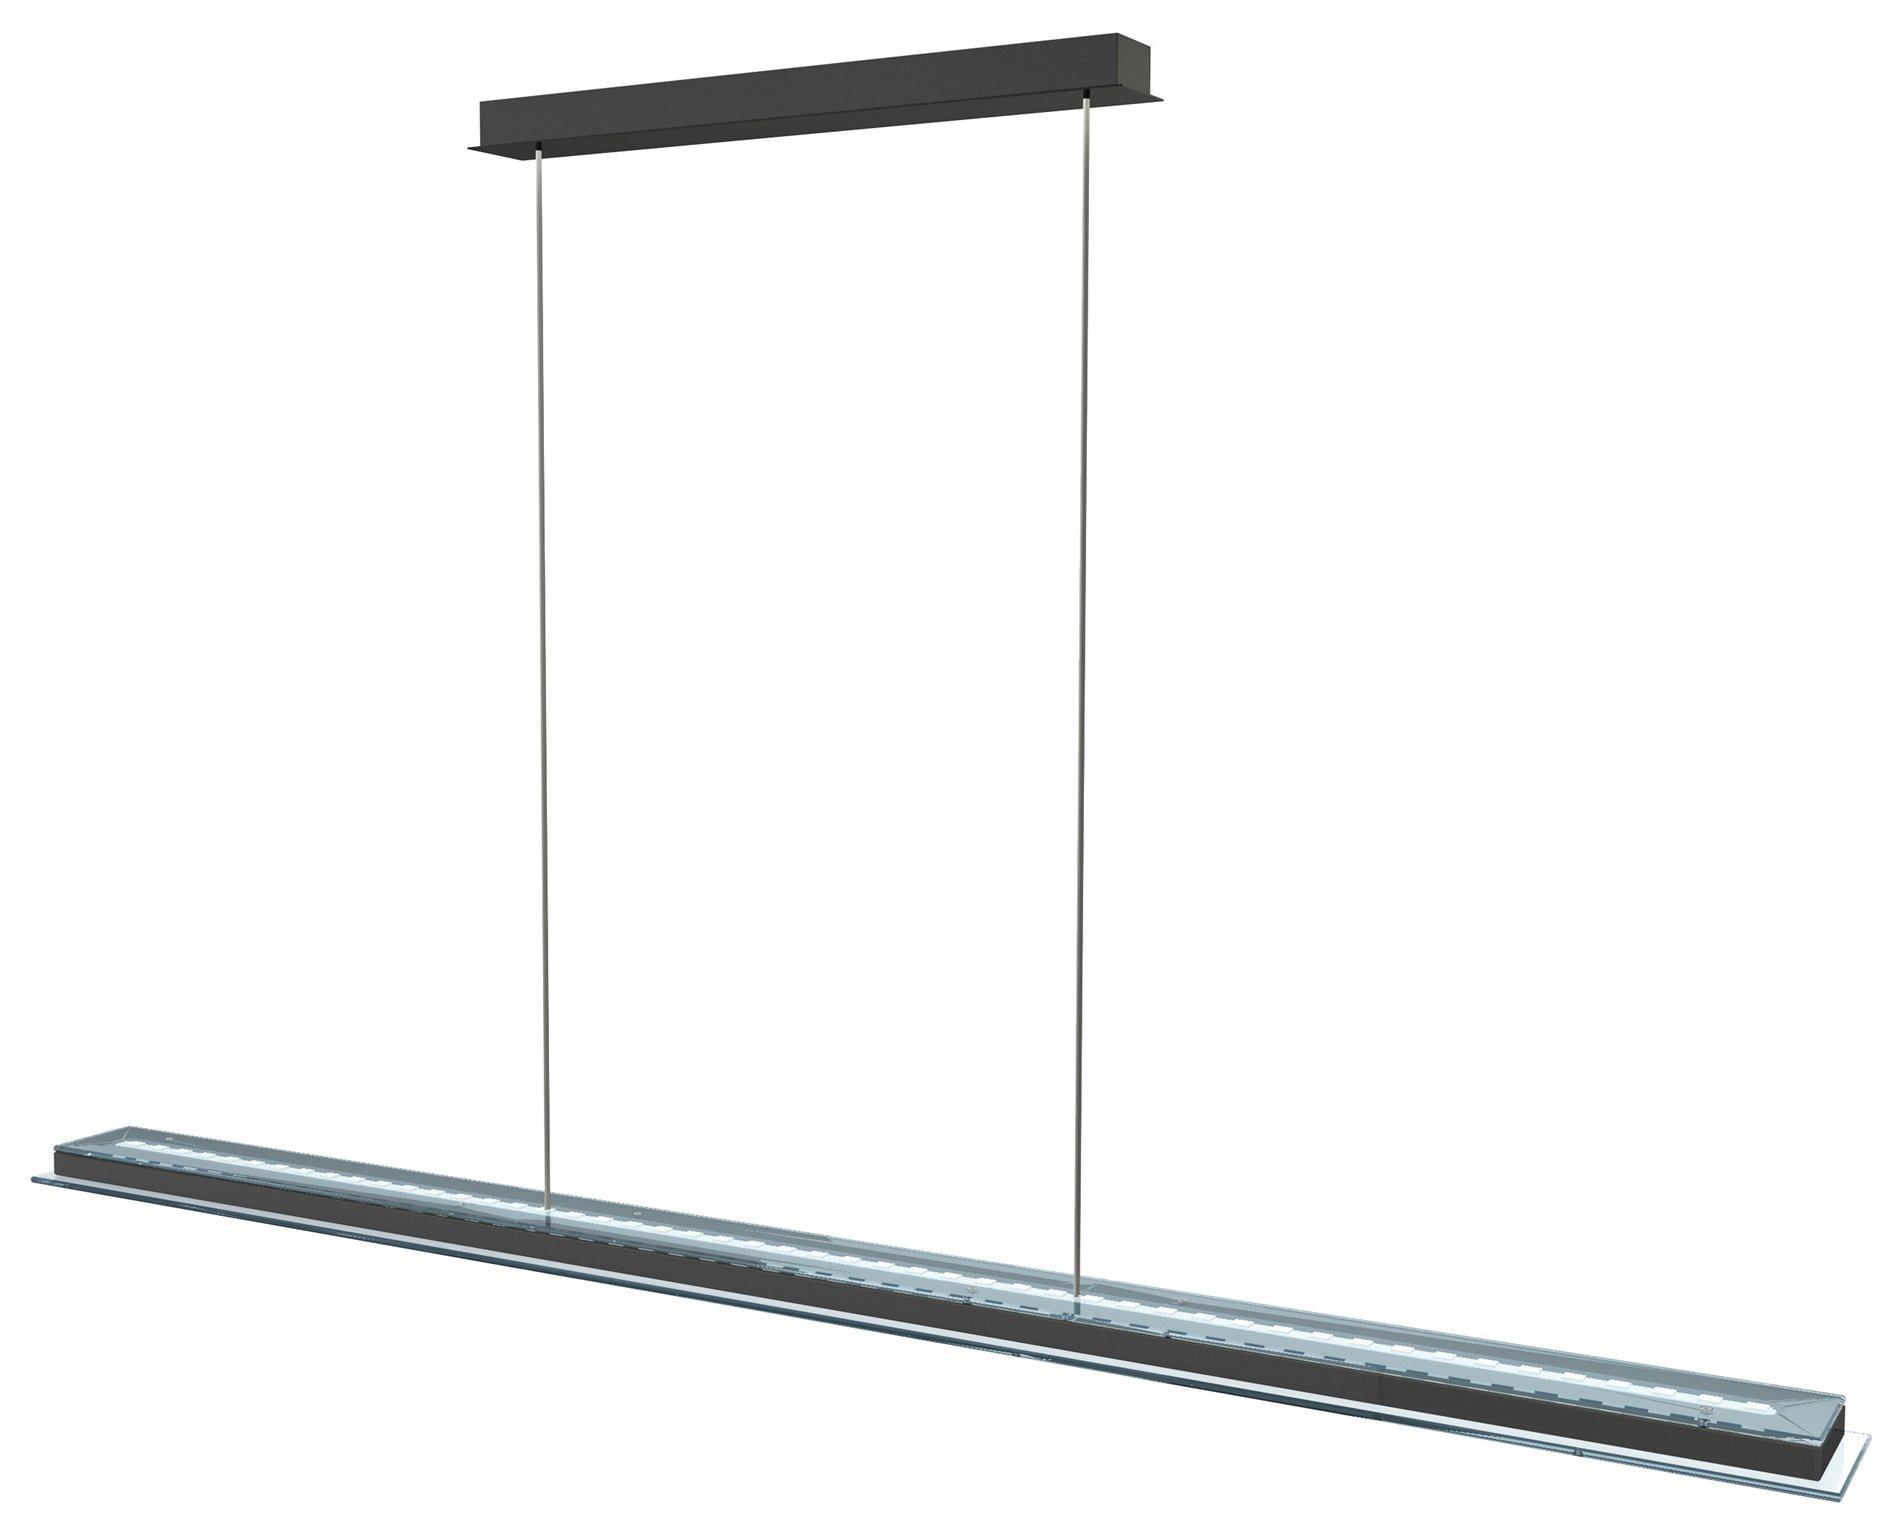 Eglo 91079A Mysterio LED Modern Contemporary Linear